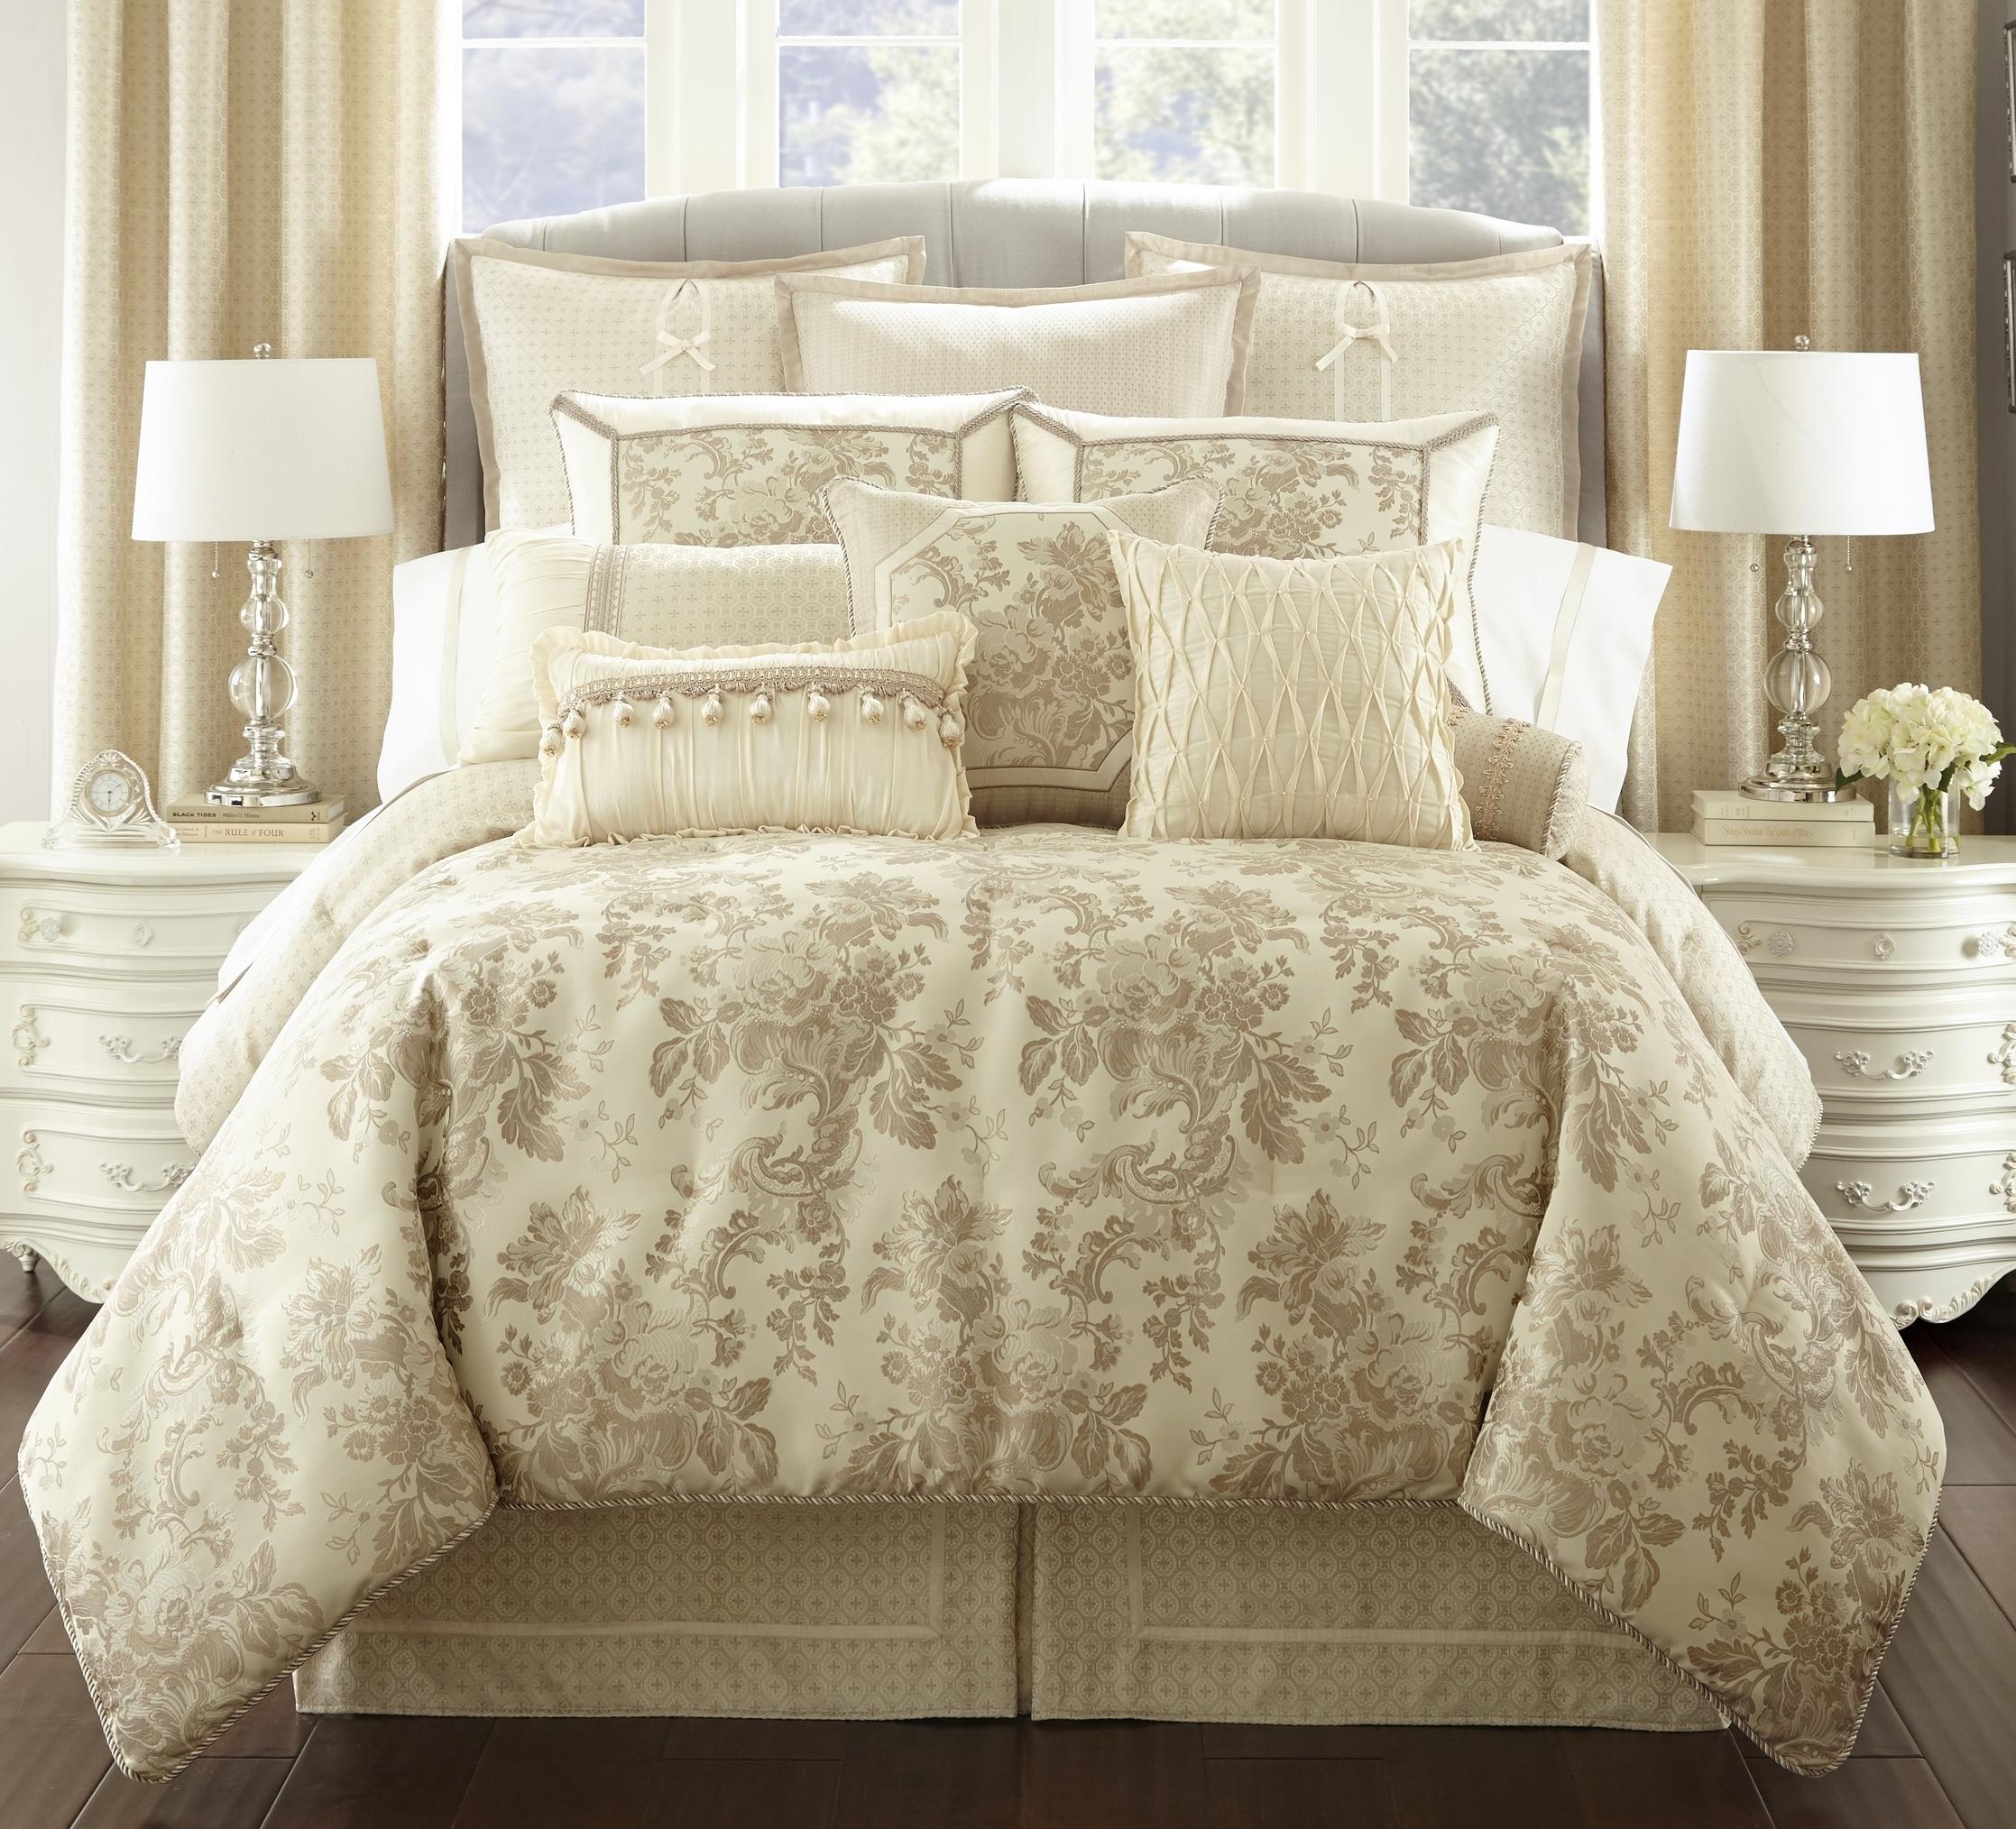 Castlequin Bed Foot RT.jpg